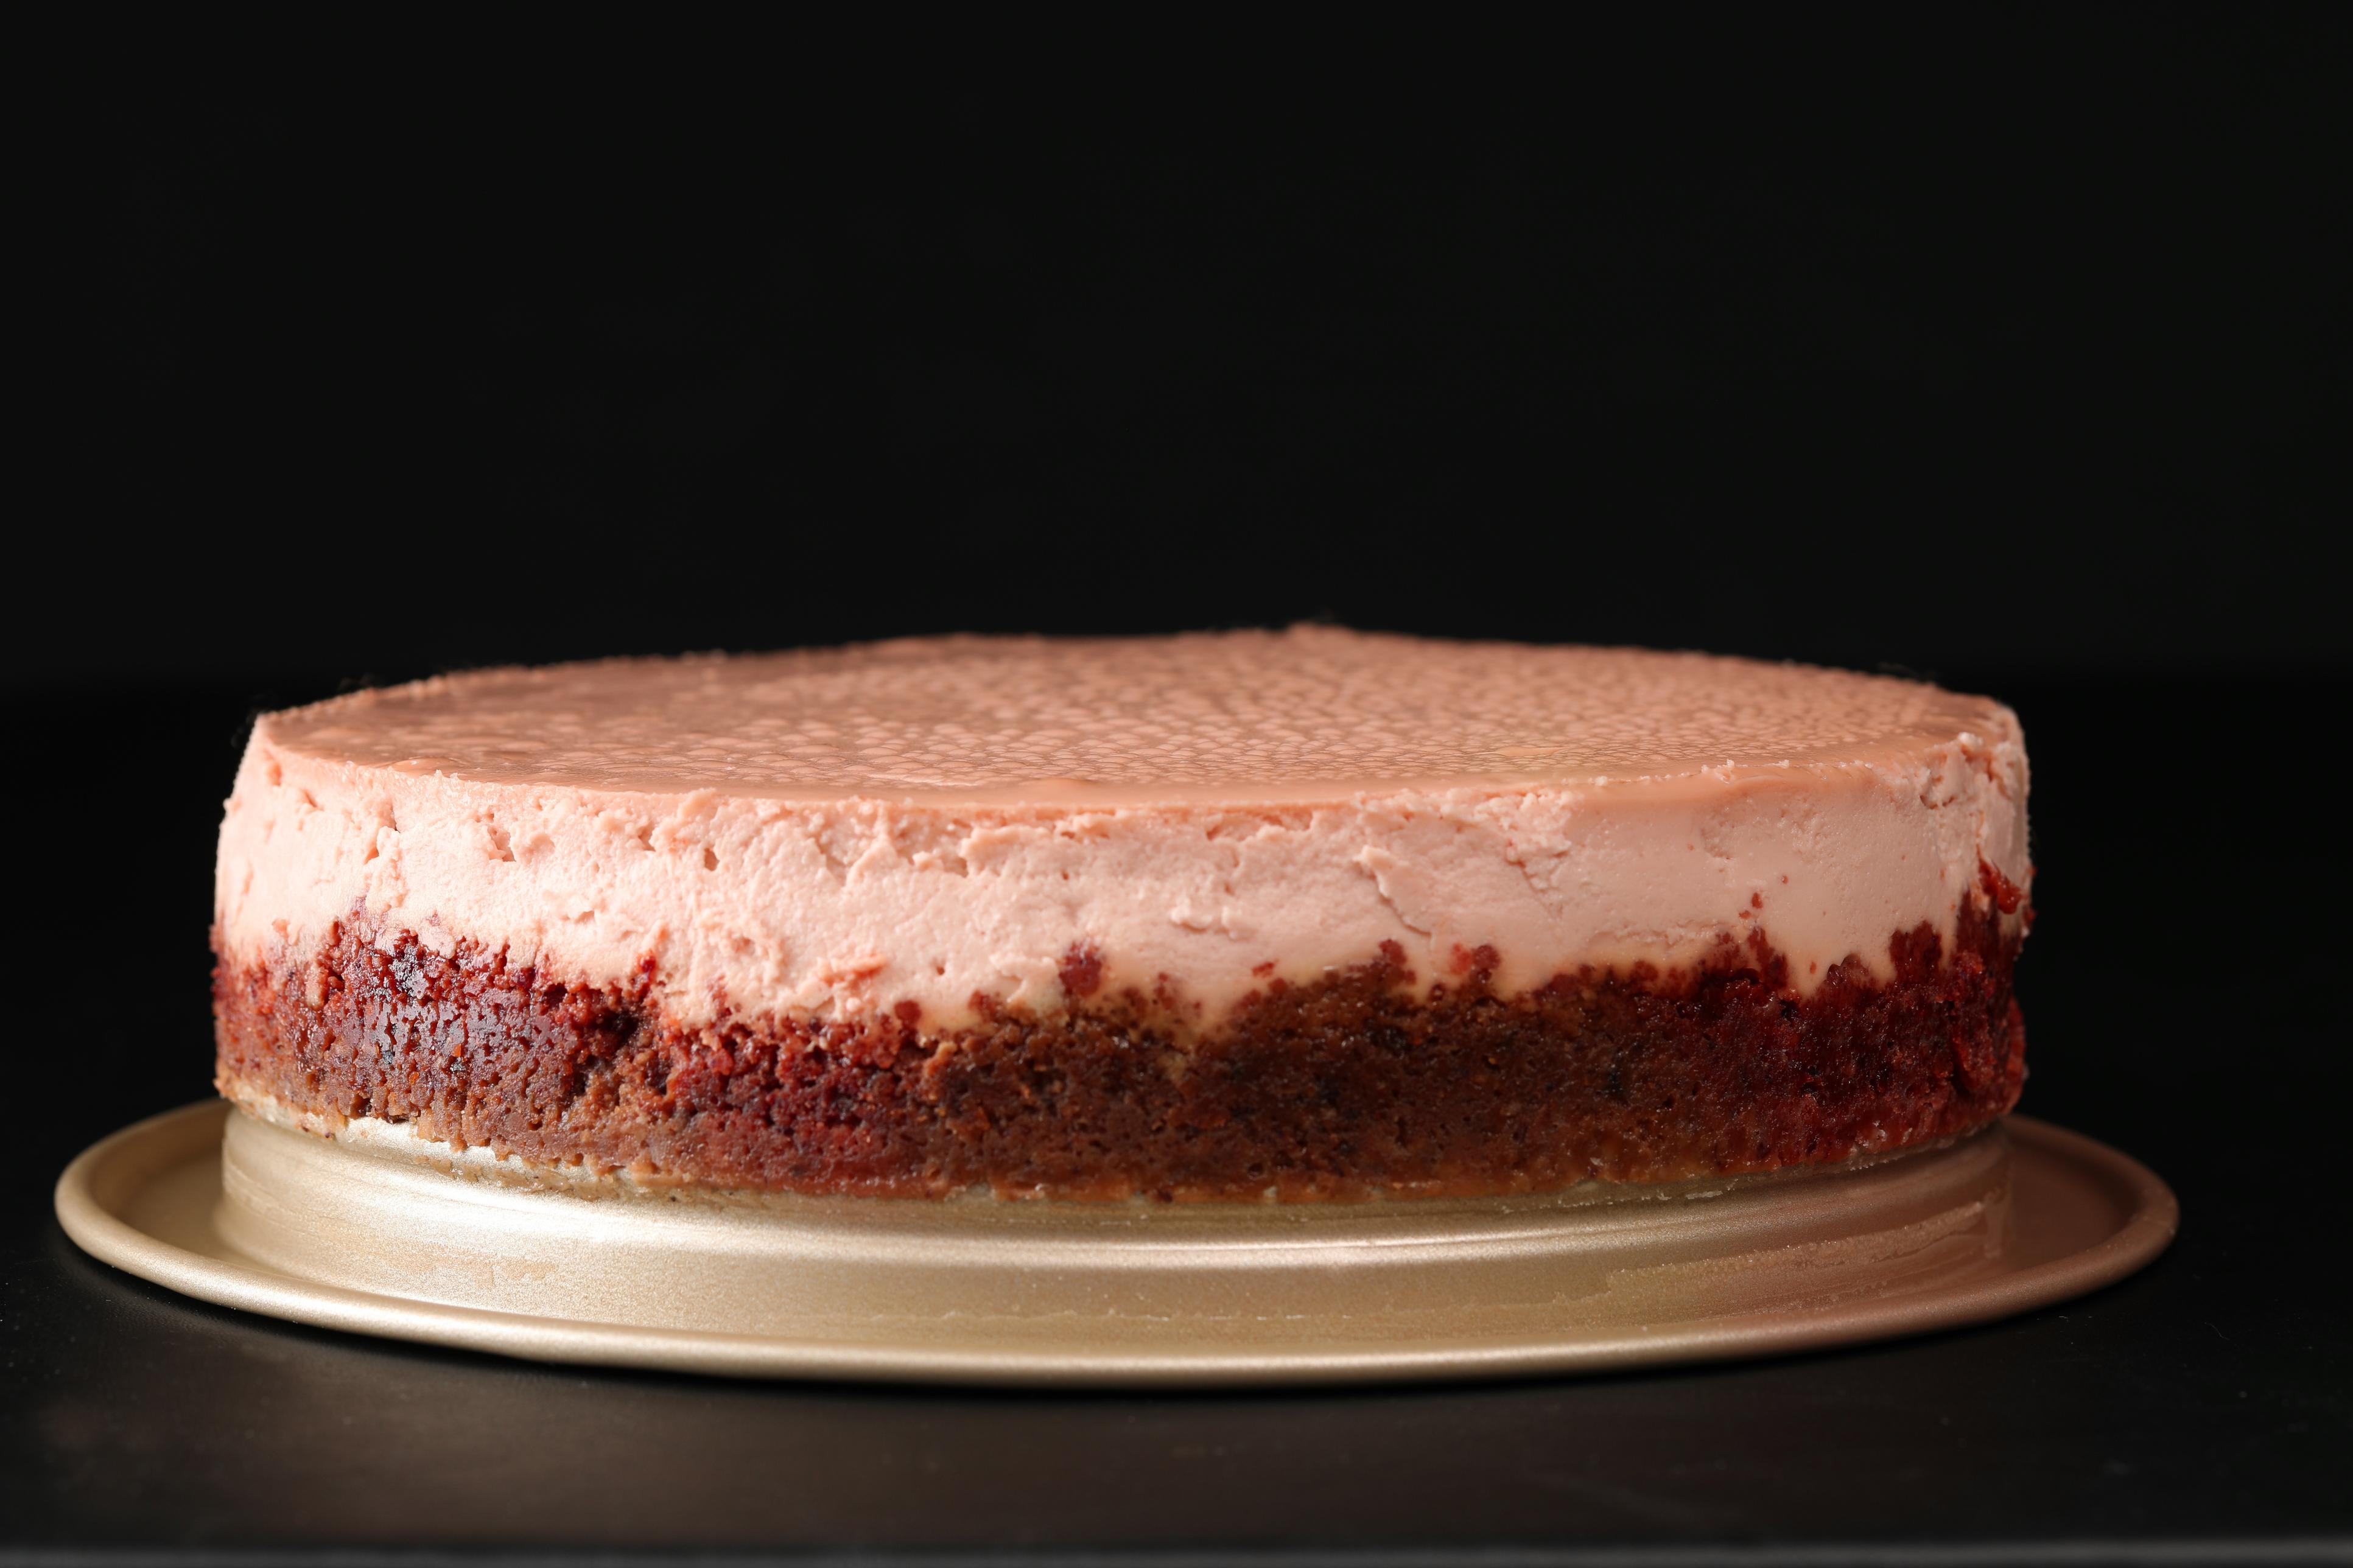 Rabarber-cheesecake med lakrids | Magasinetliv.dk